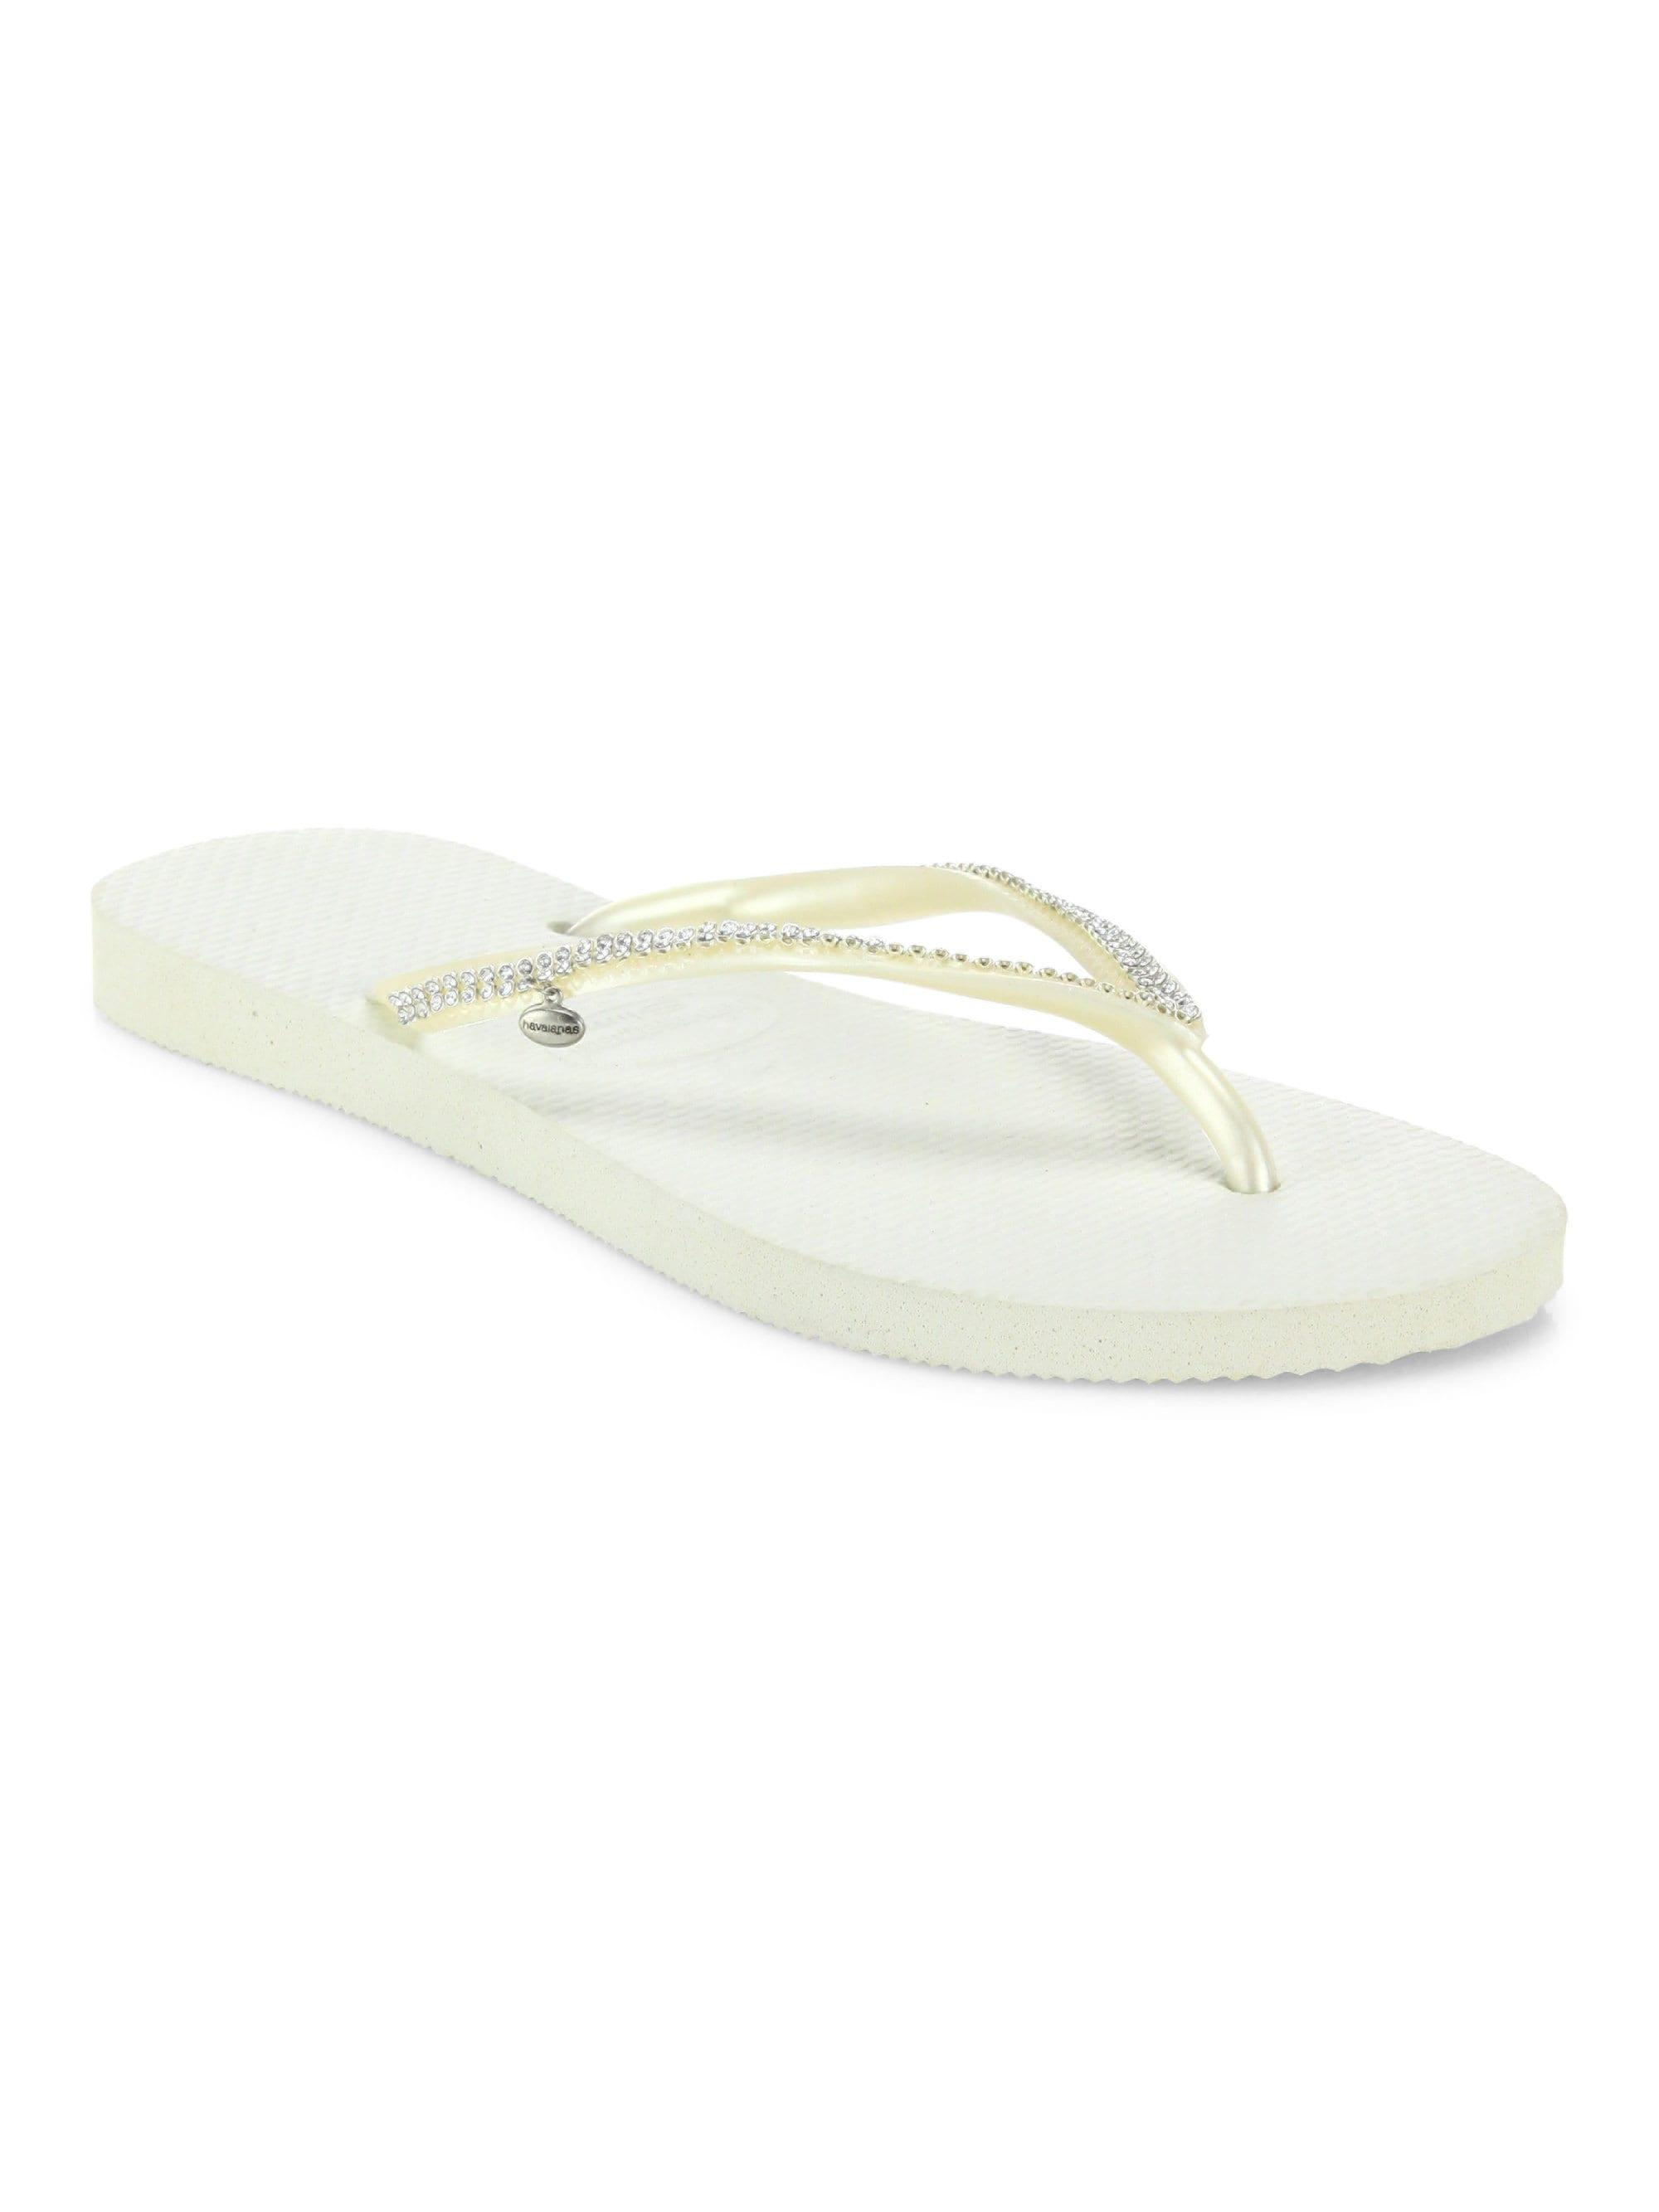 3e7236ae8a02 Havaianas - White Slim Crystal Mesh Flip Flops - Lyst. View fullscreen